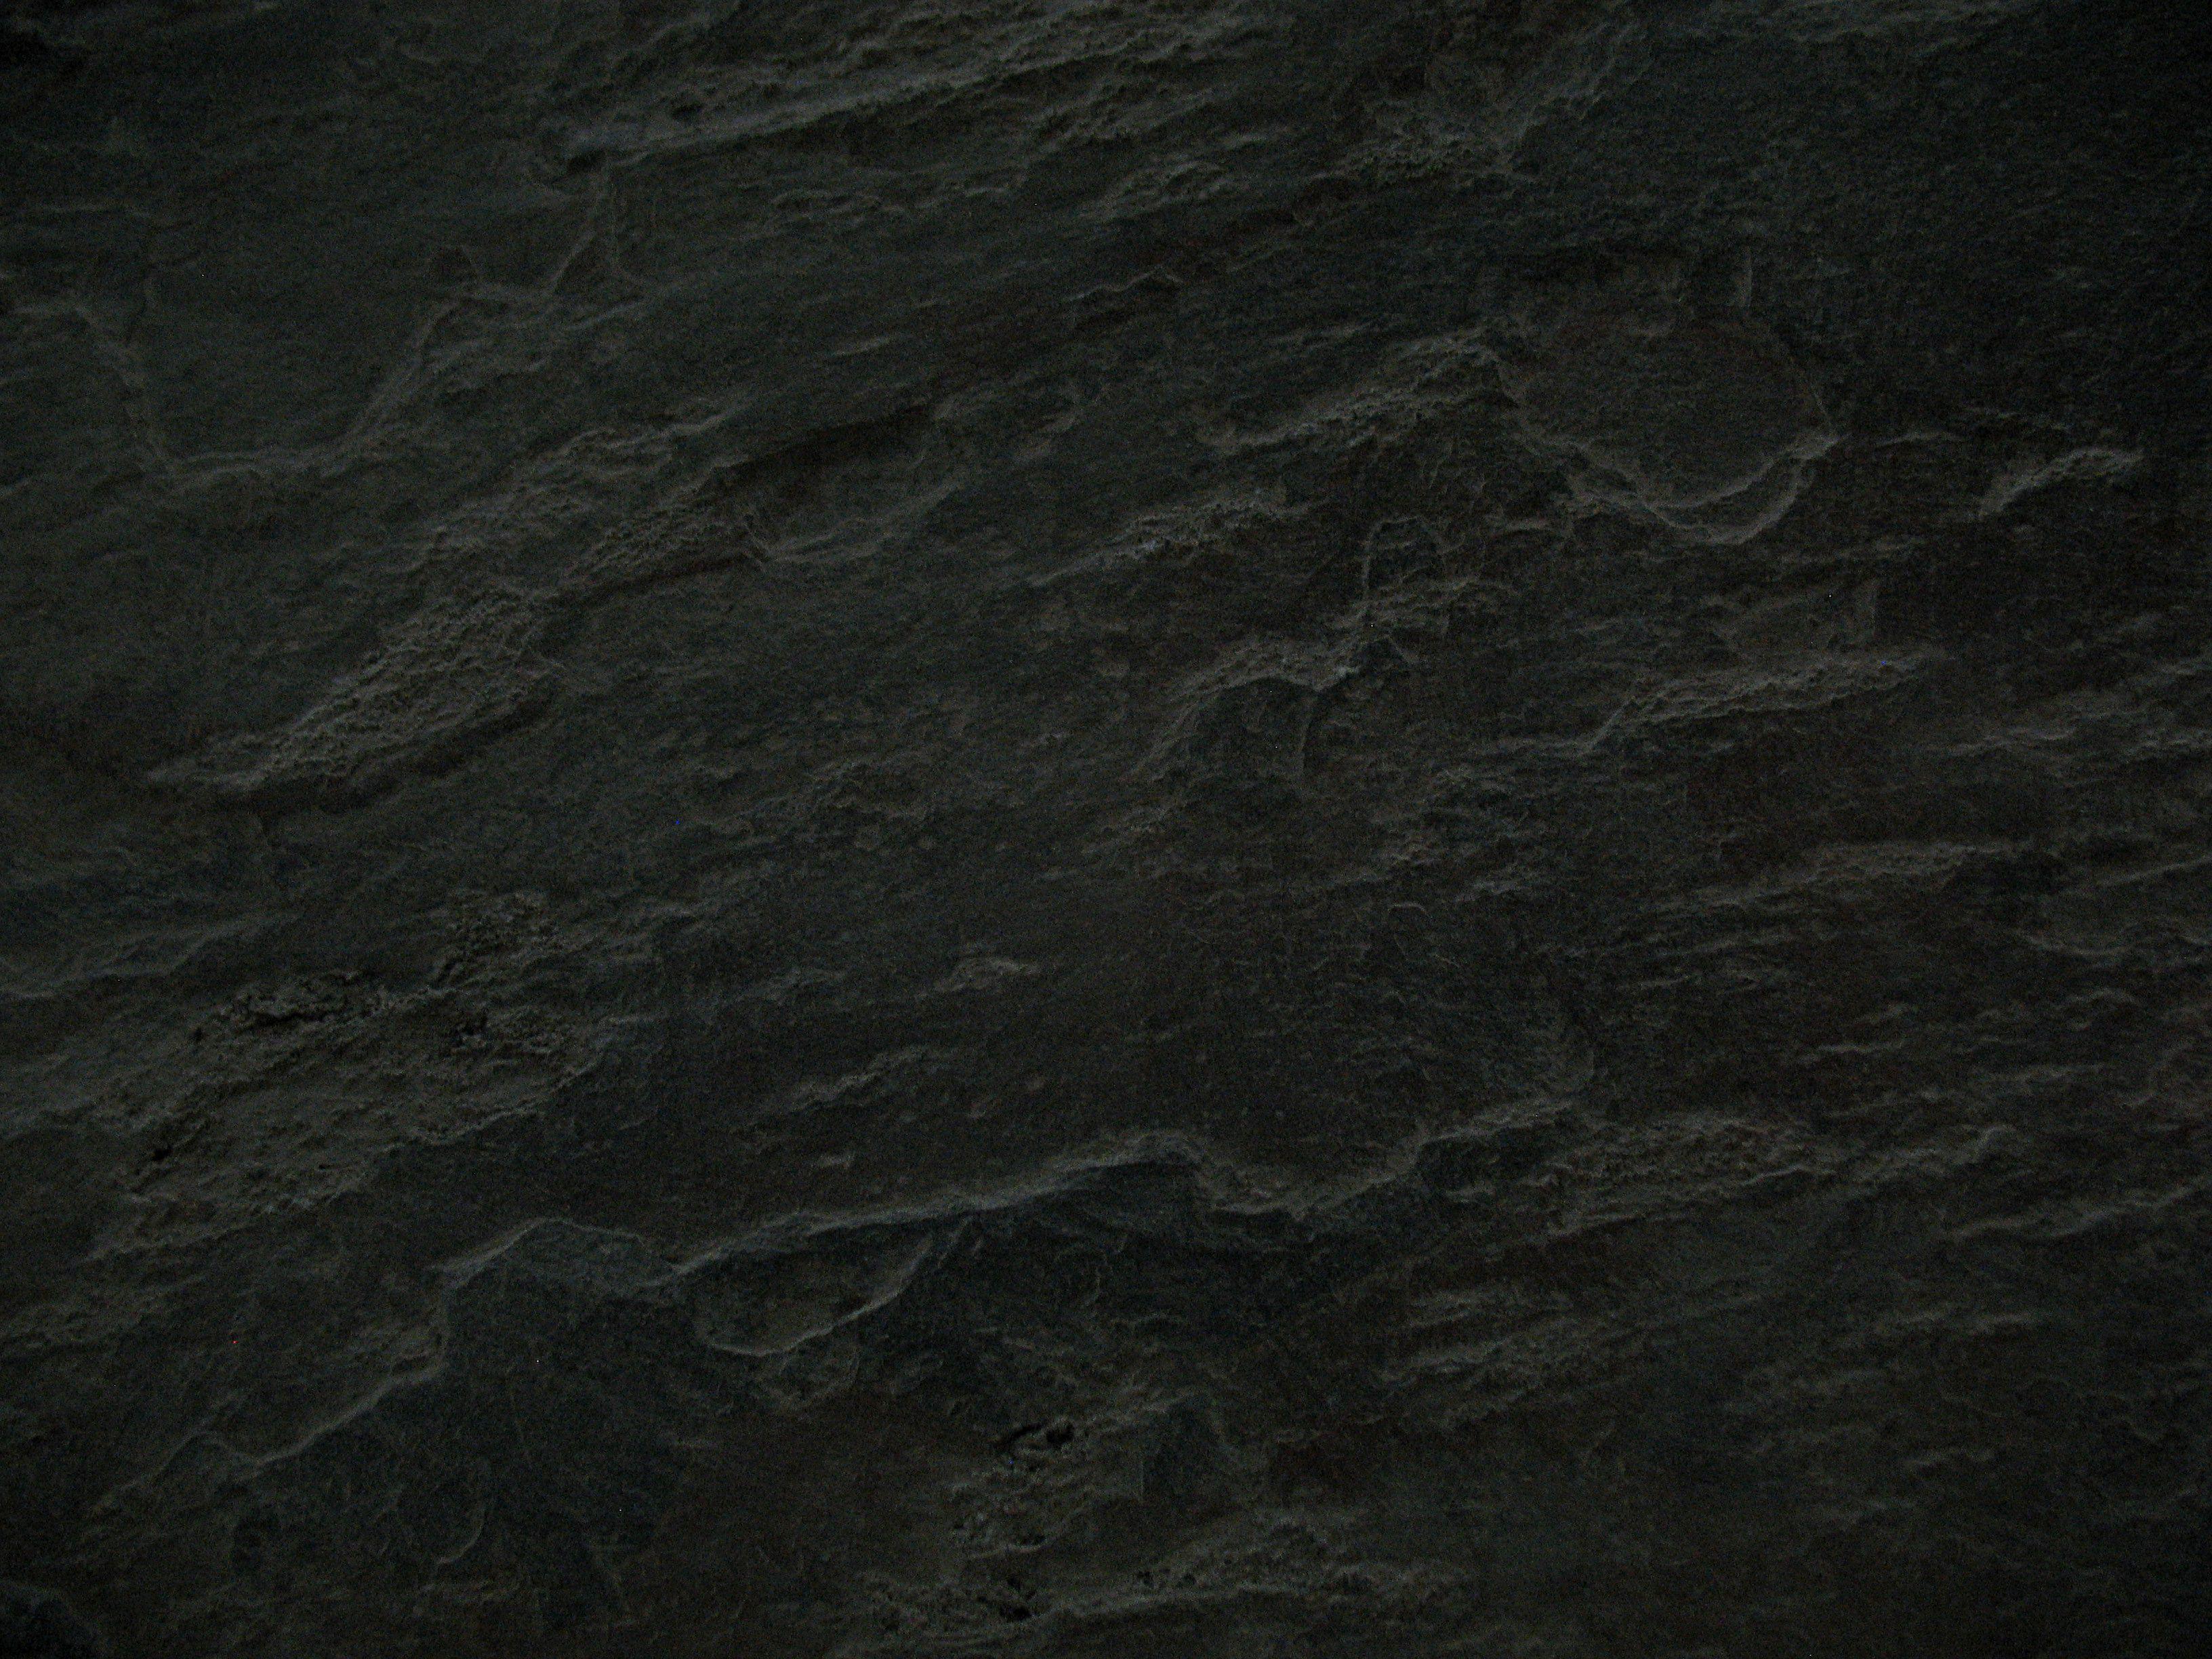 slate texture - Google Search   Texture   Pinterest   Slate, Texture ...